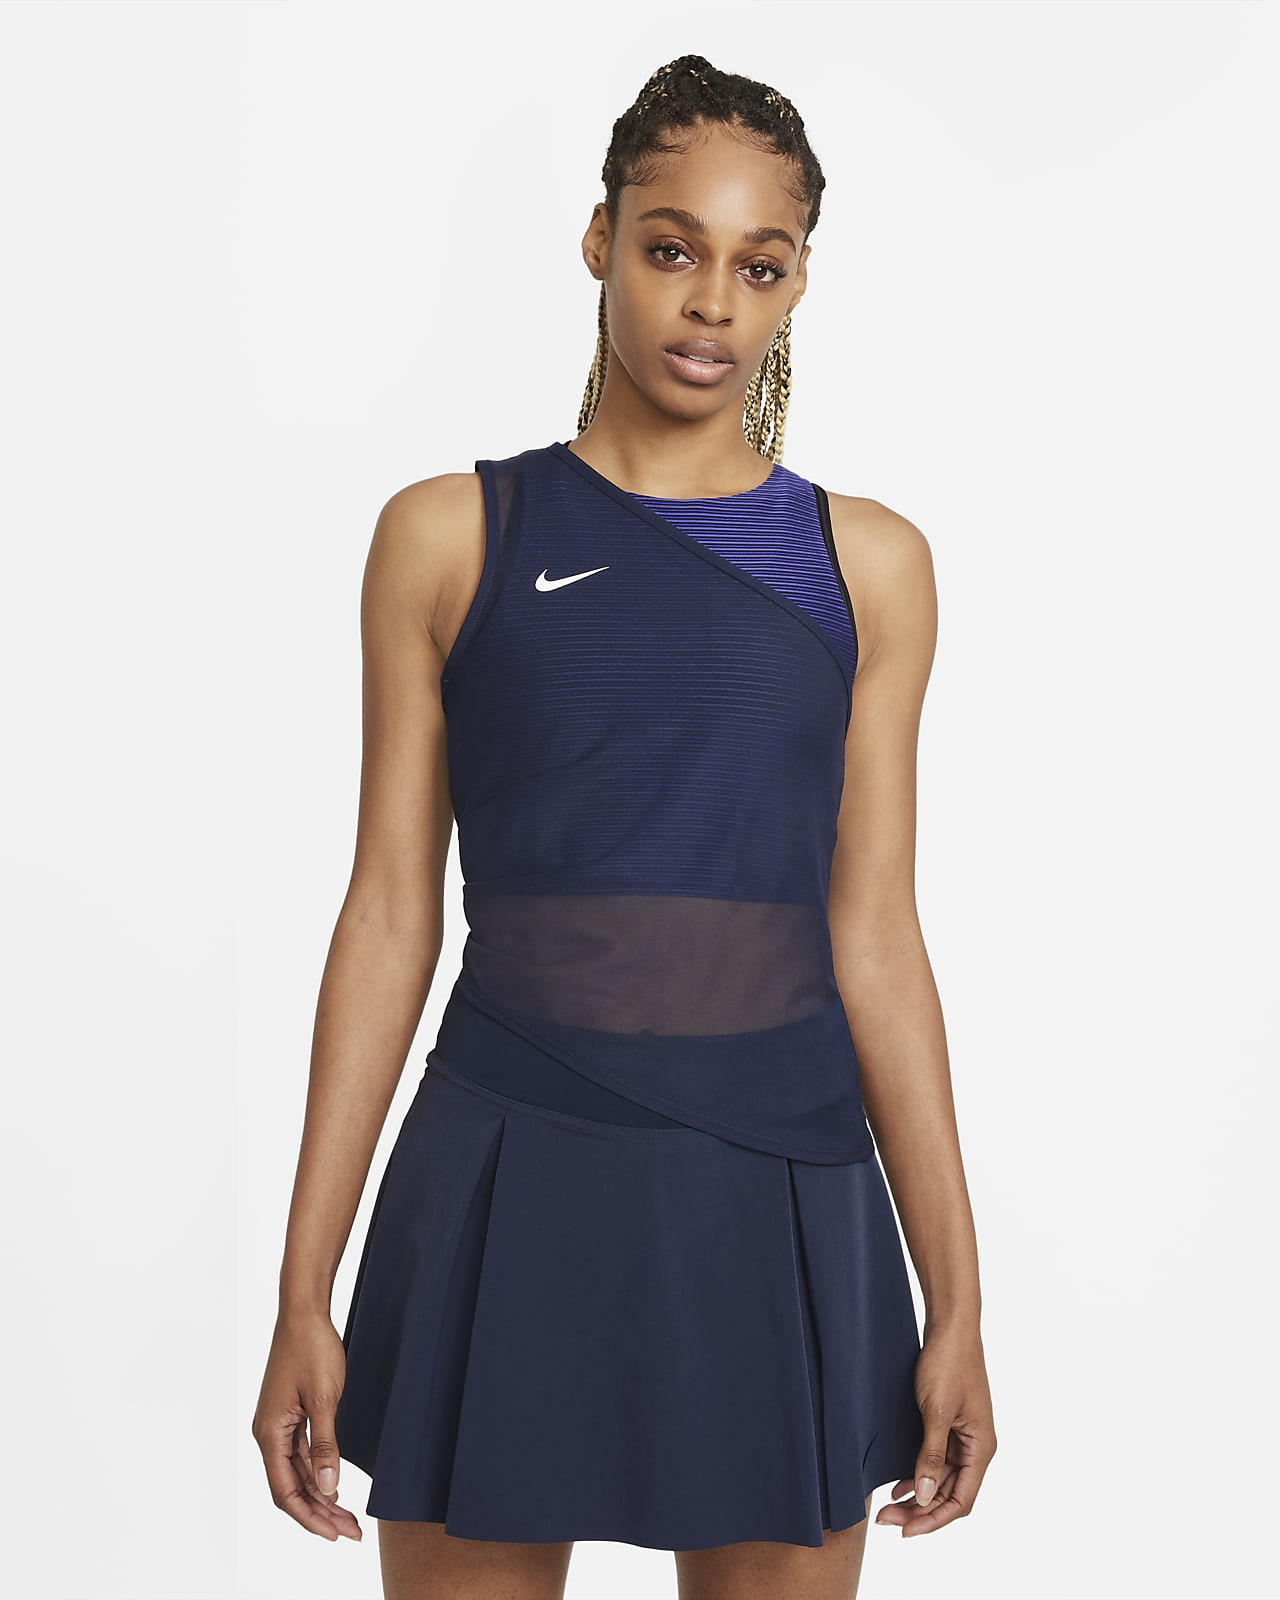 Camisola de ténis sem mangas NikeCourt Dri-FIT ADV Slam para mulher